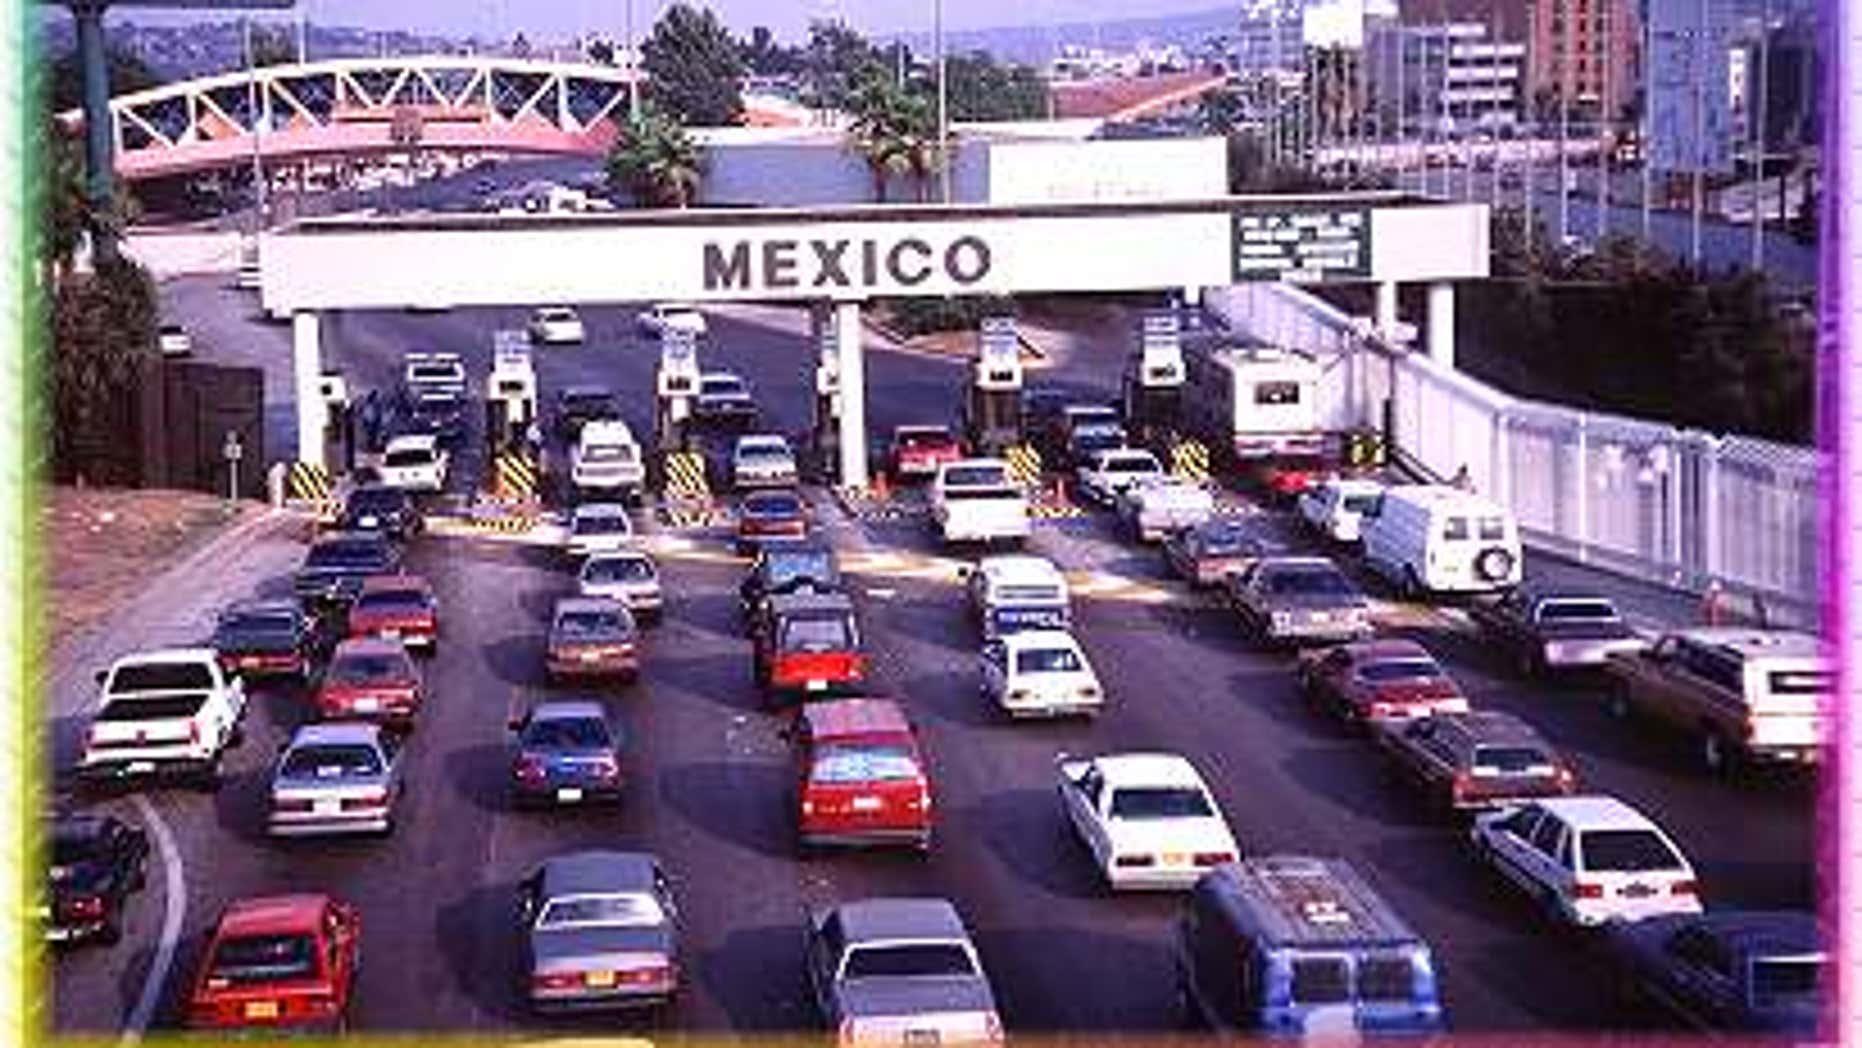 Tijuana border crossing between the U.S.-Mexico border near San Diego, Calif.